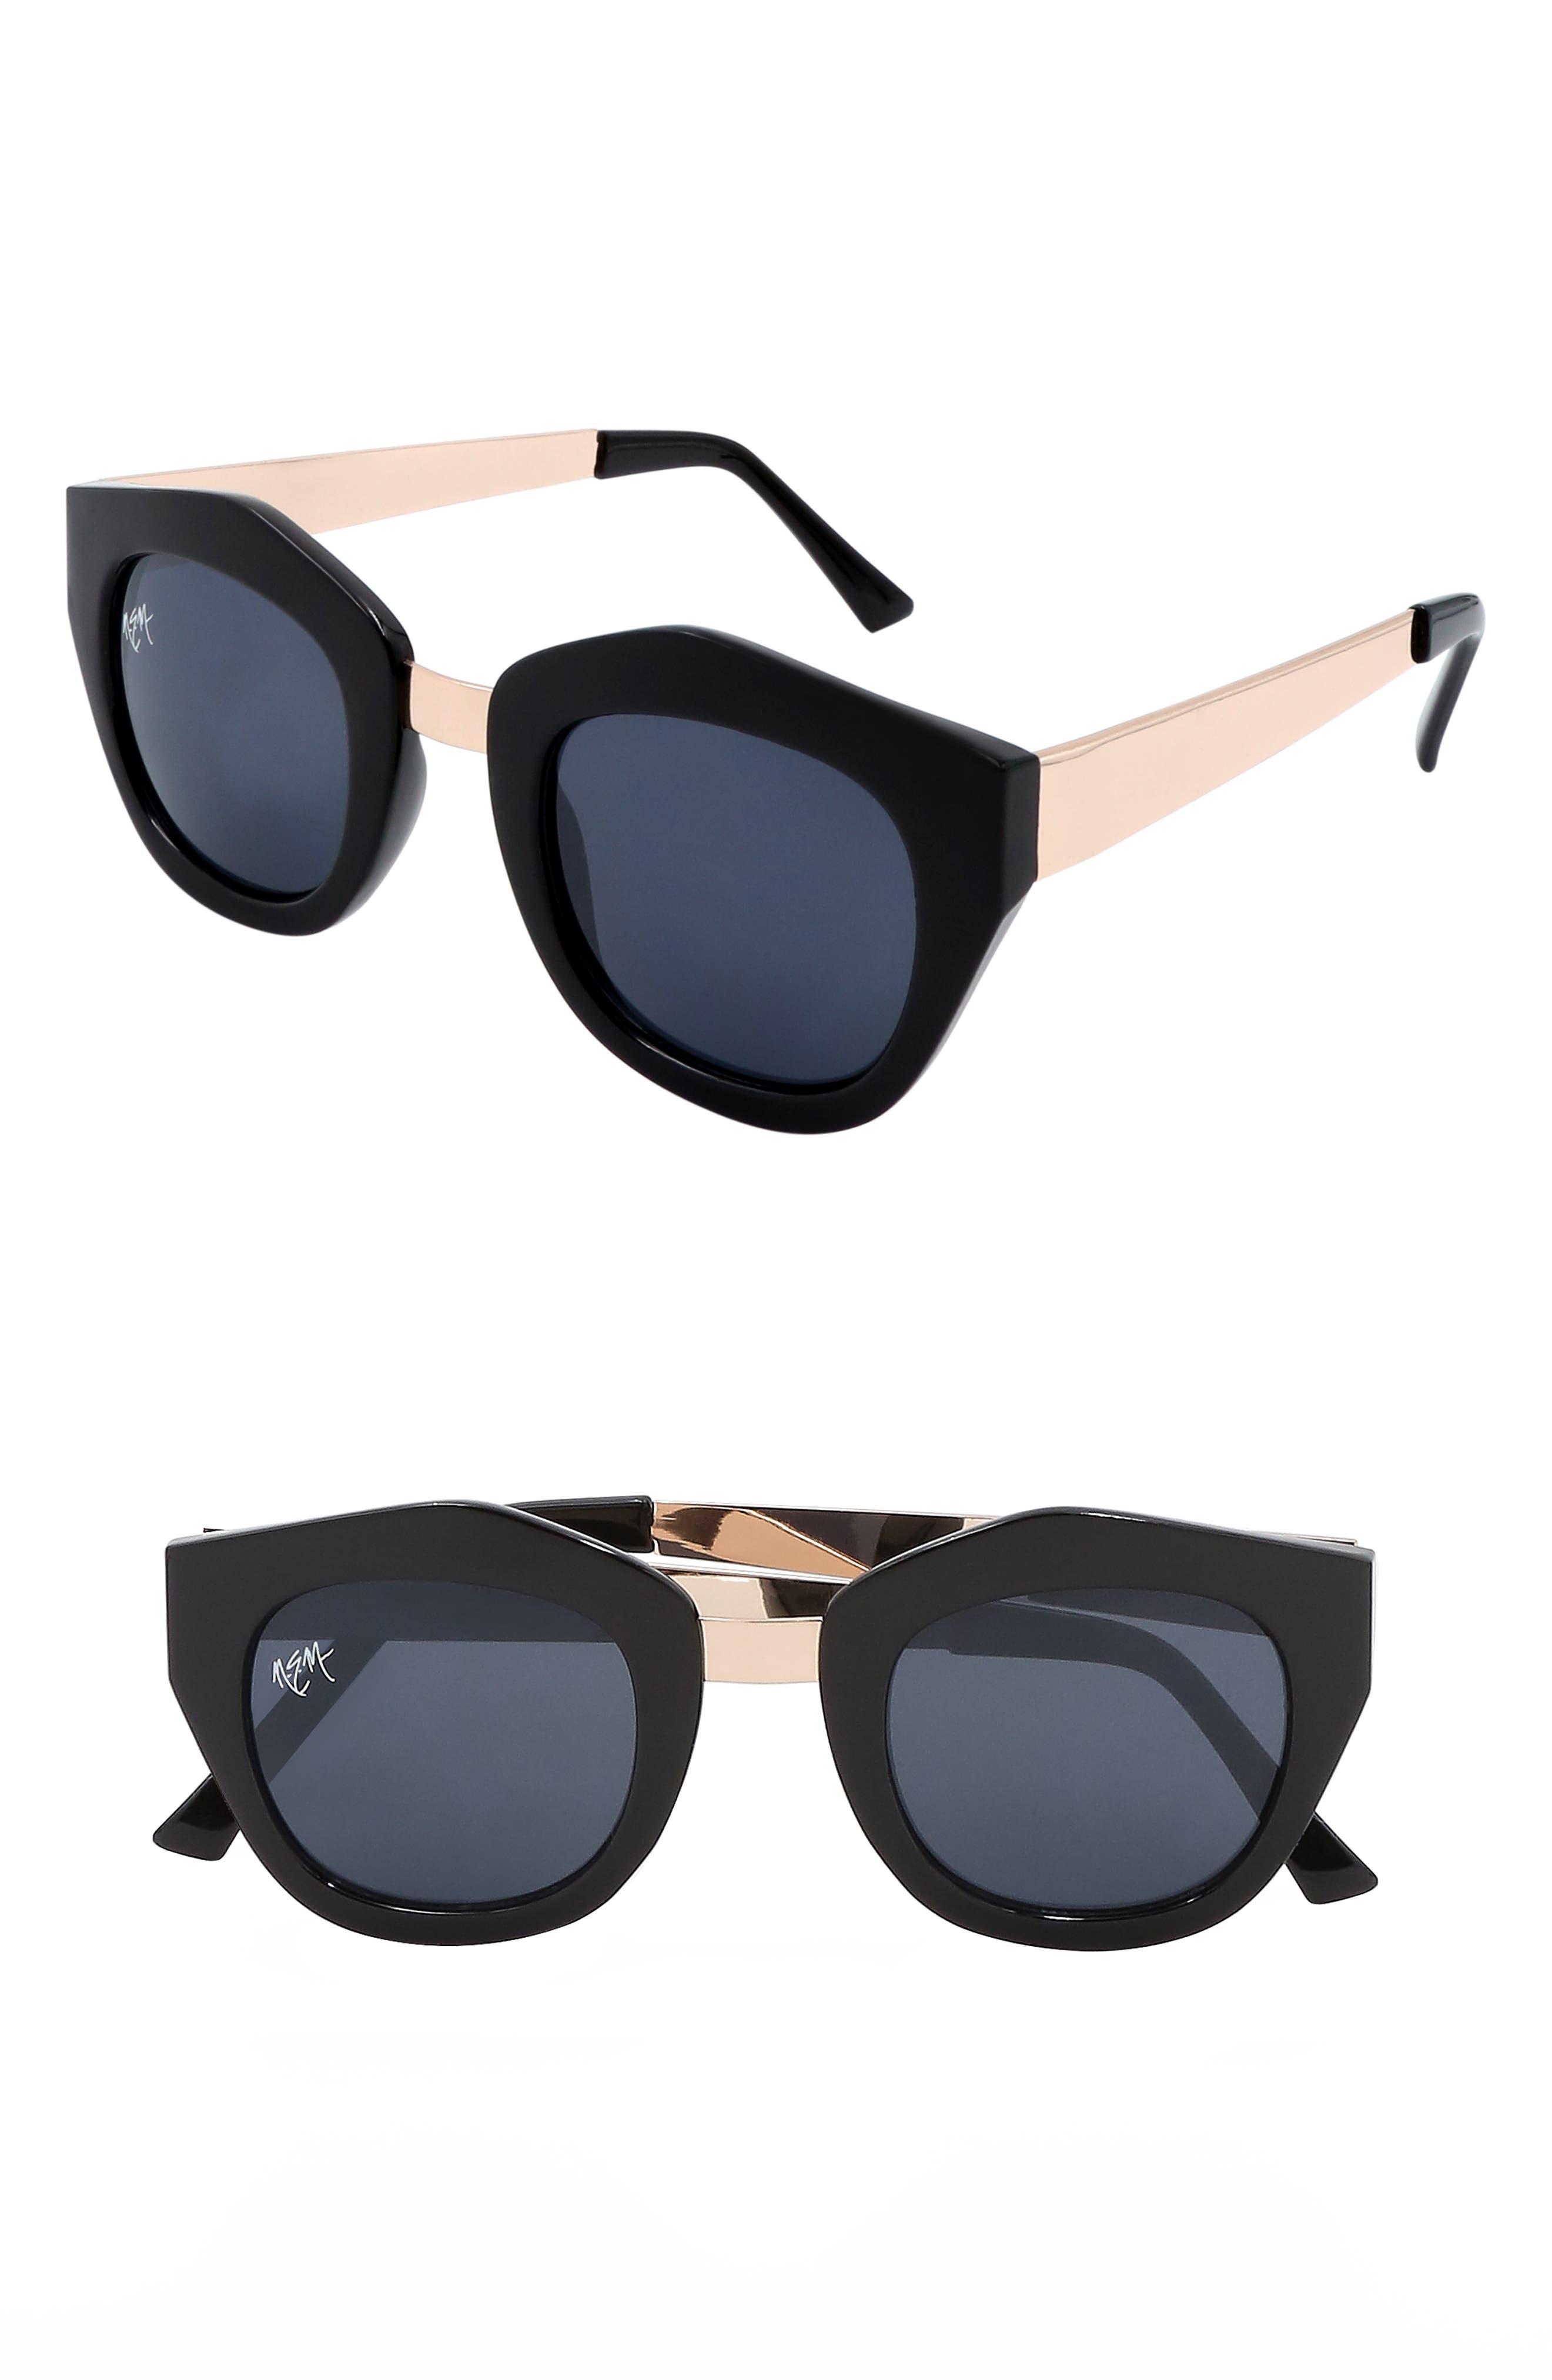 Envy 45mm Angular Sunglasses,                             Main thumbnail 1, color,                             BLACK W DARK LENS